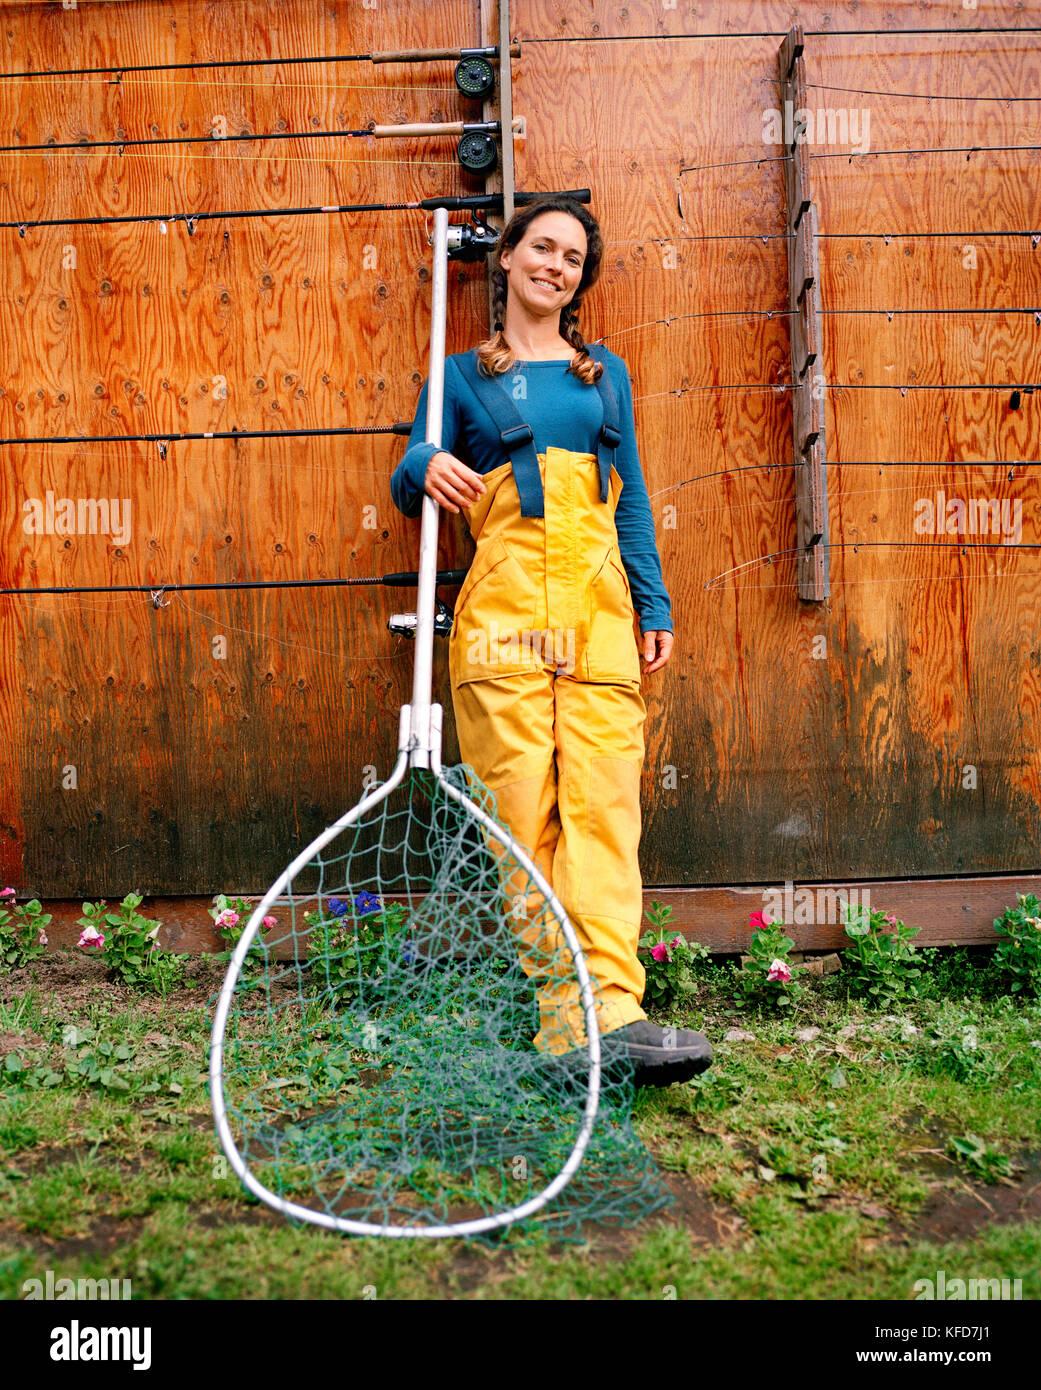 USA, Alaska, Redoubt Bay, a young woman fishing guide holds a fishing net, Redoubt Bay Lodge - Stock Image